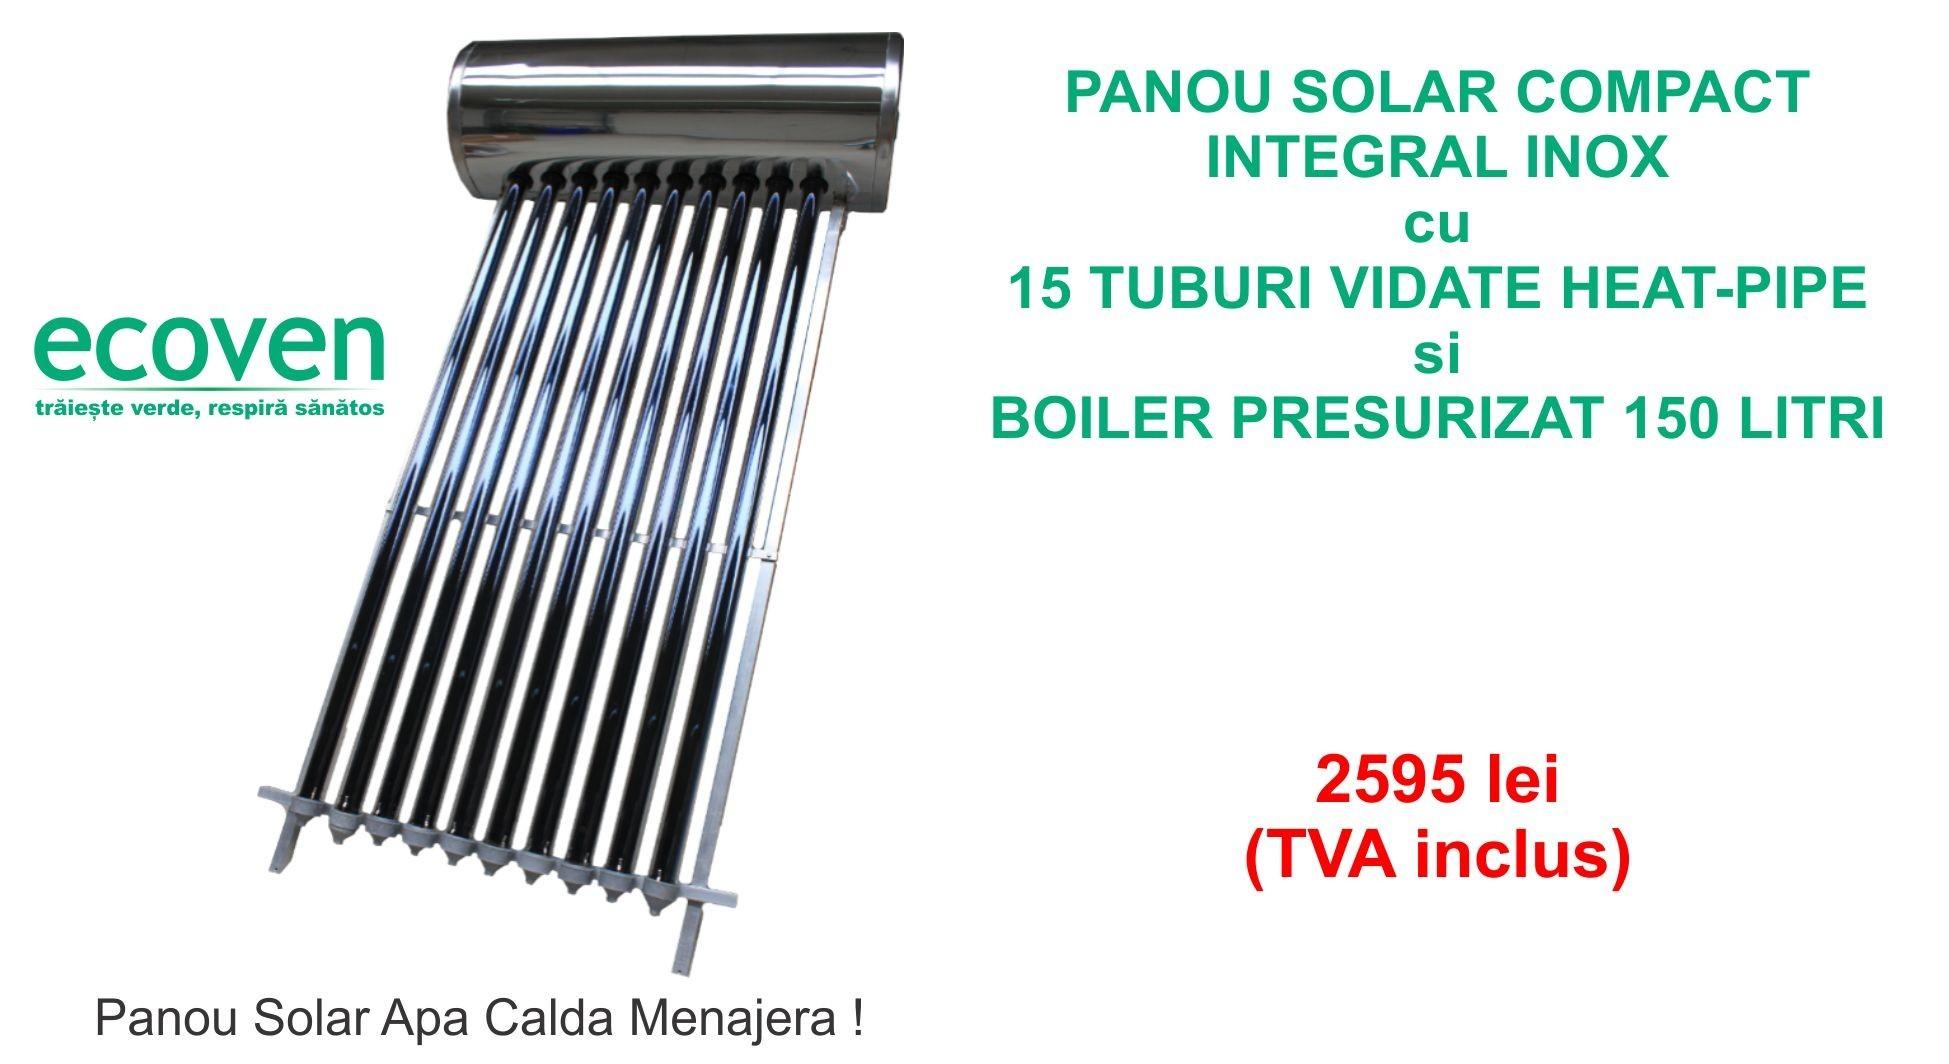 Panou solar presurizat compact integral inox 15 tuburi vidate boiler 150 litri